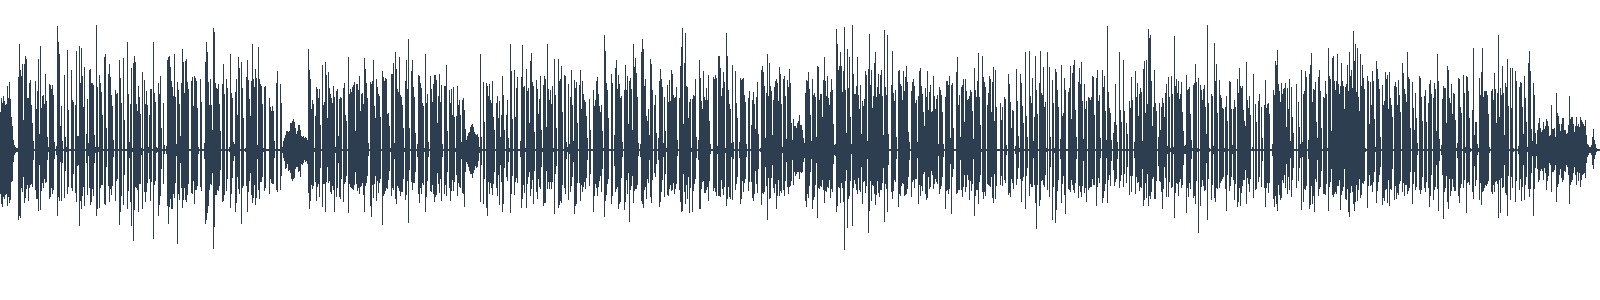 Nikdykde - ukázka z audioknihy waveform